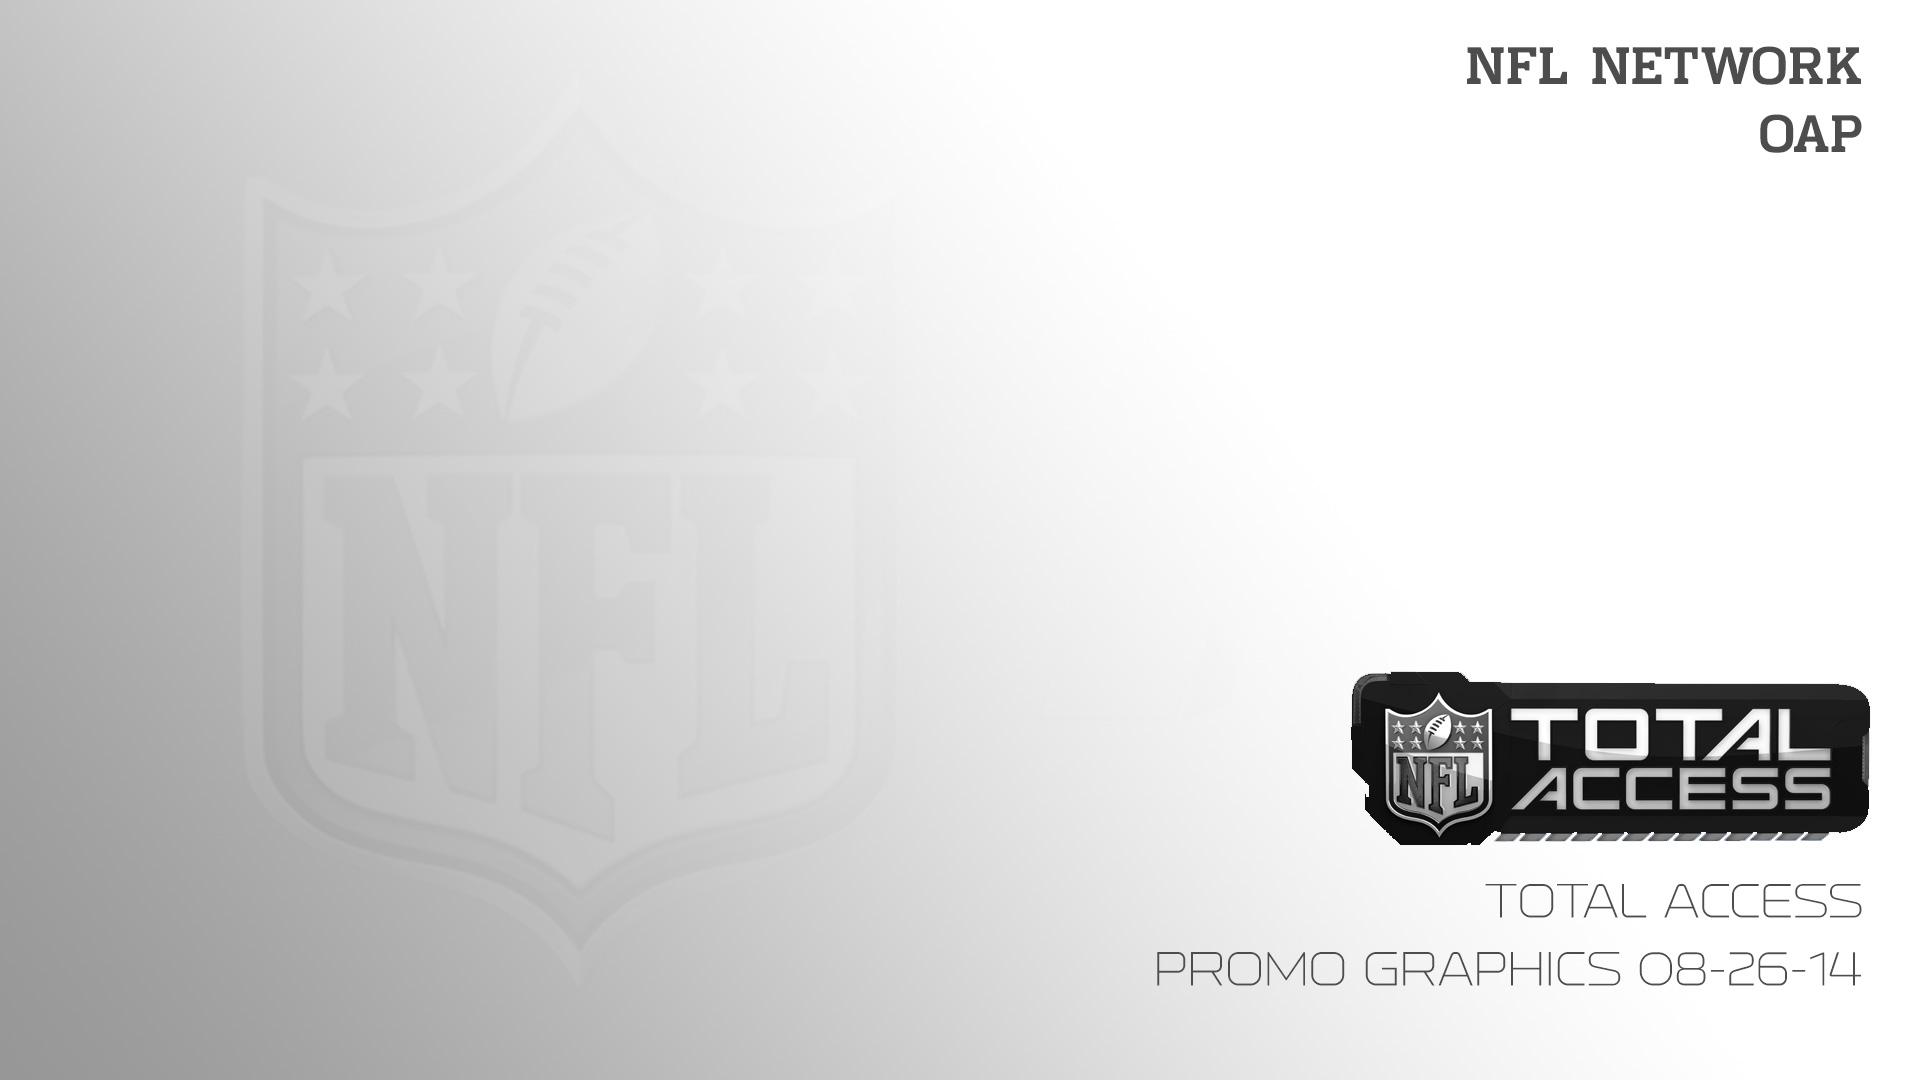 NFLN_PDF-cover.jpg